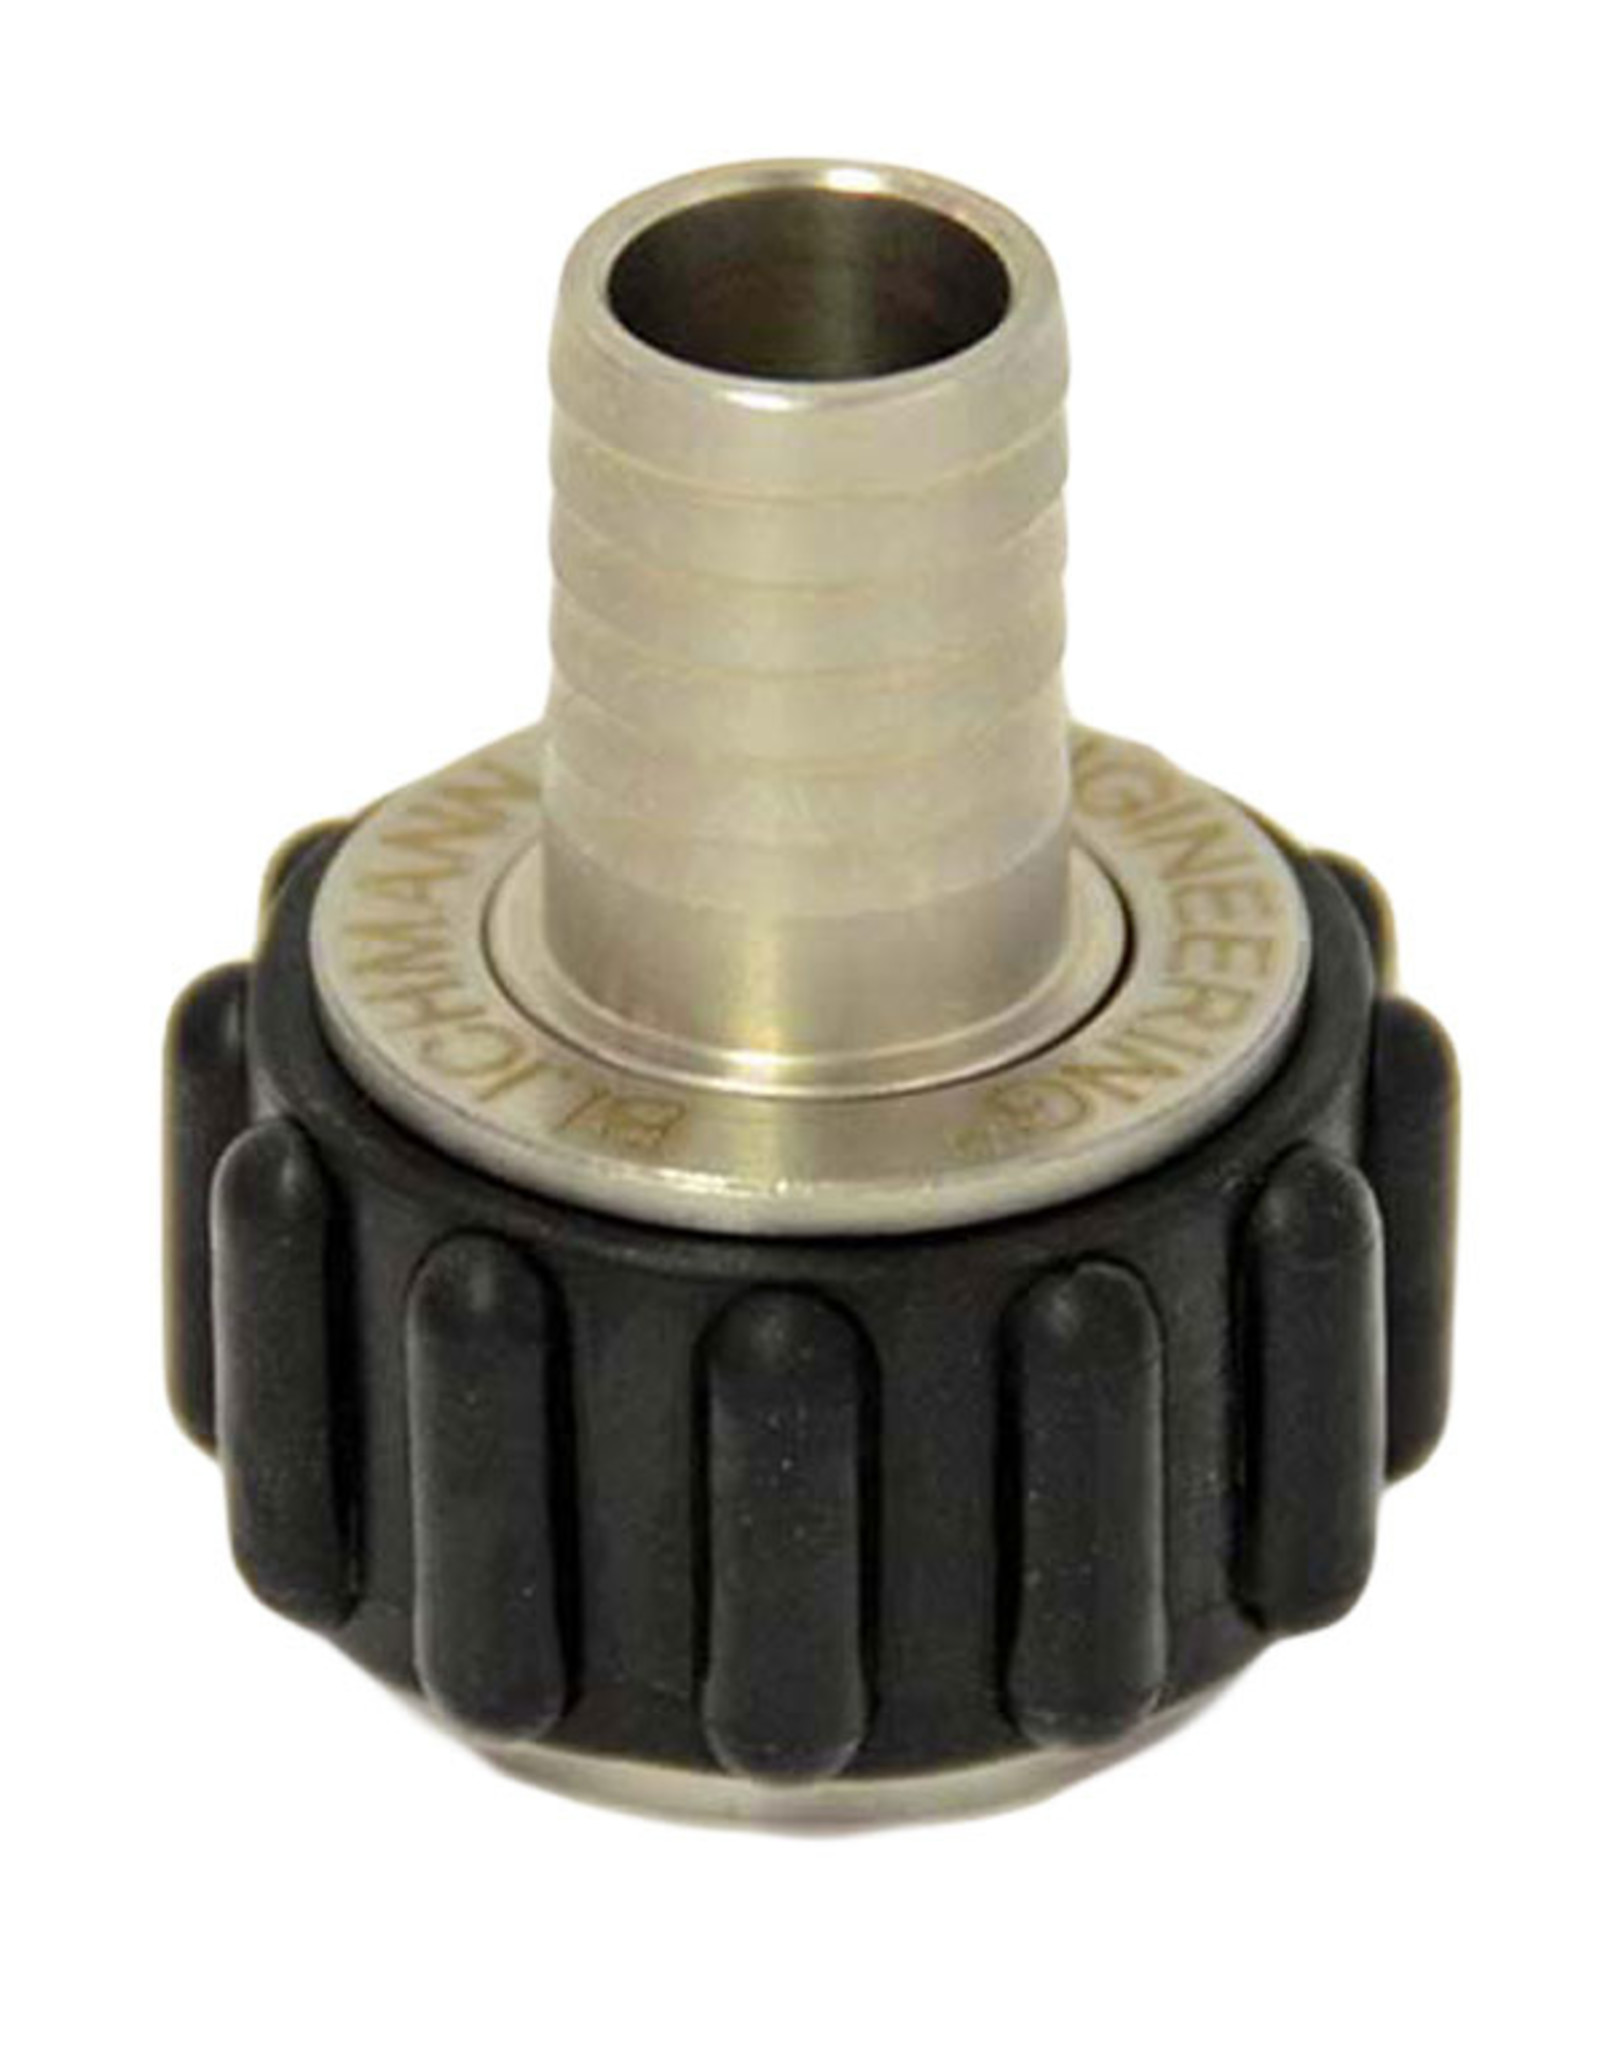 "Blichmann Quick Connector 1/2"" Barb X 1/2"" Npt"